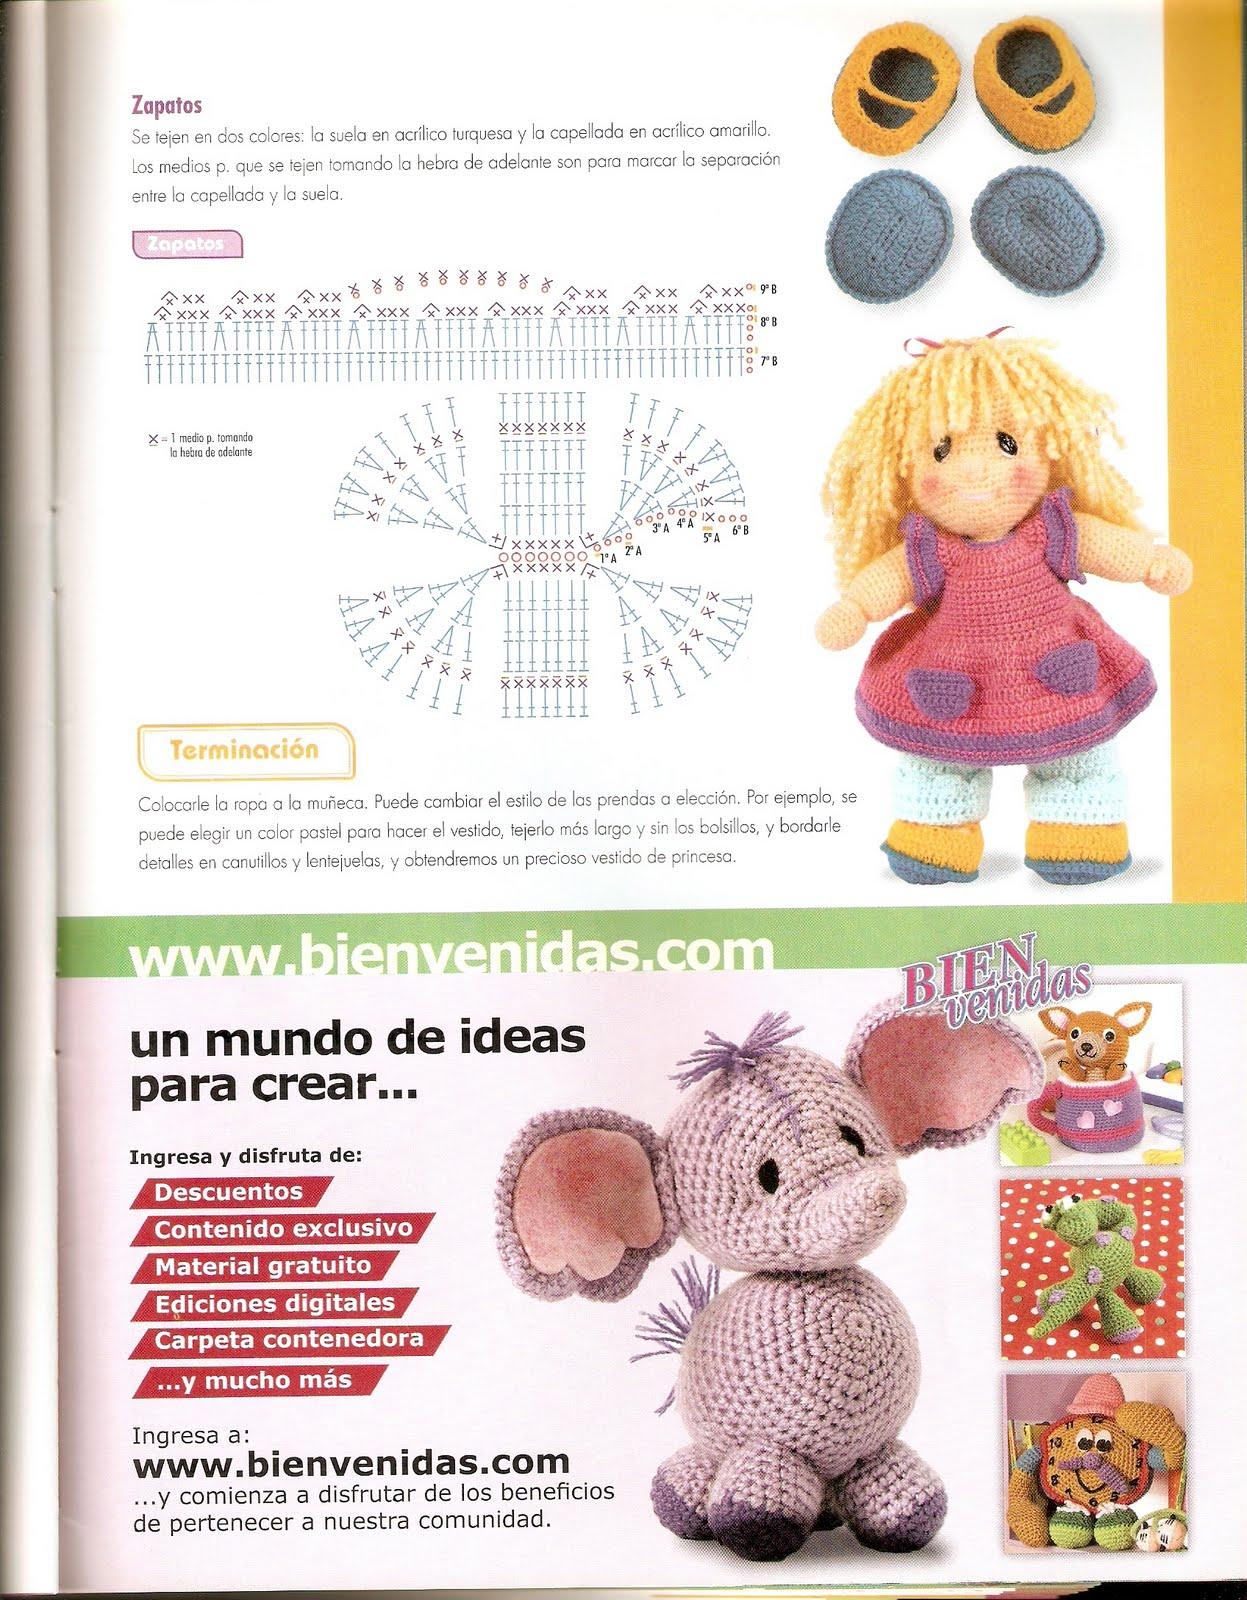 Amigurumi Halloween Schemi Gratis : bambola paffuta amigurumi 6 - magiedifilo.it punto croce ...